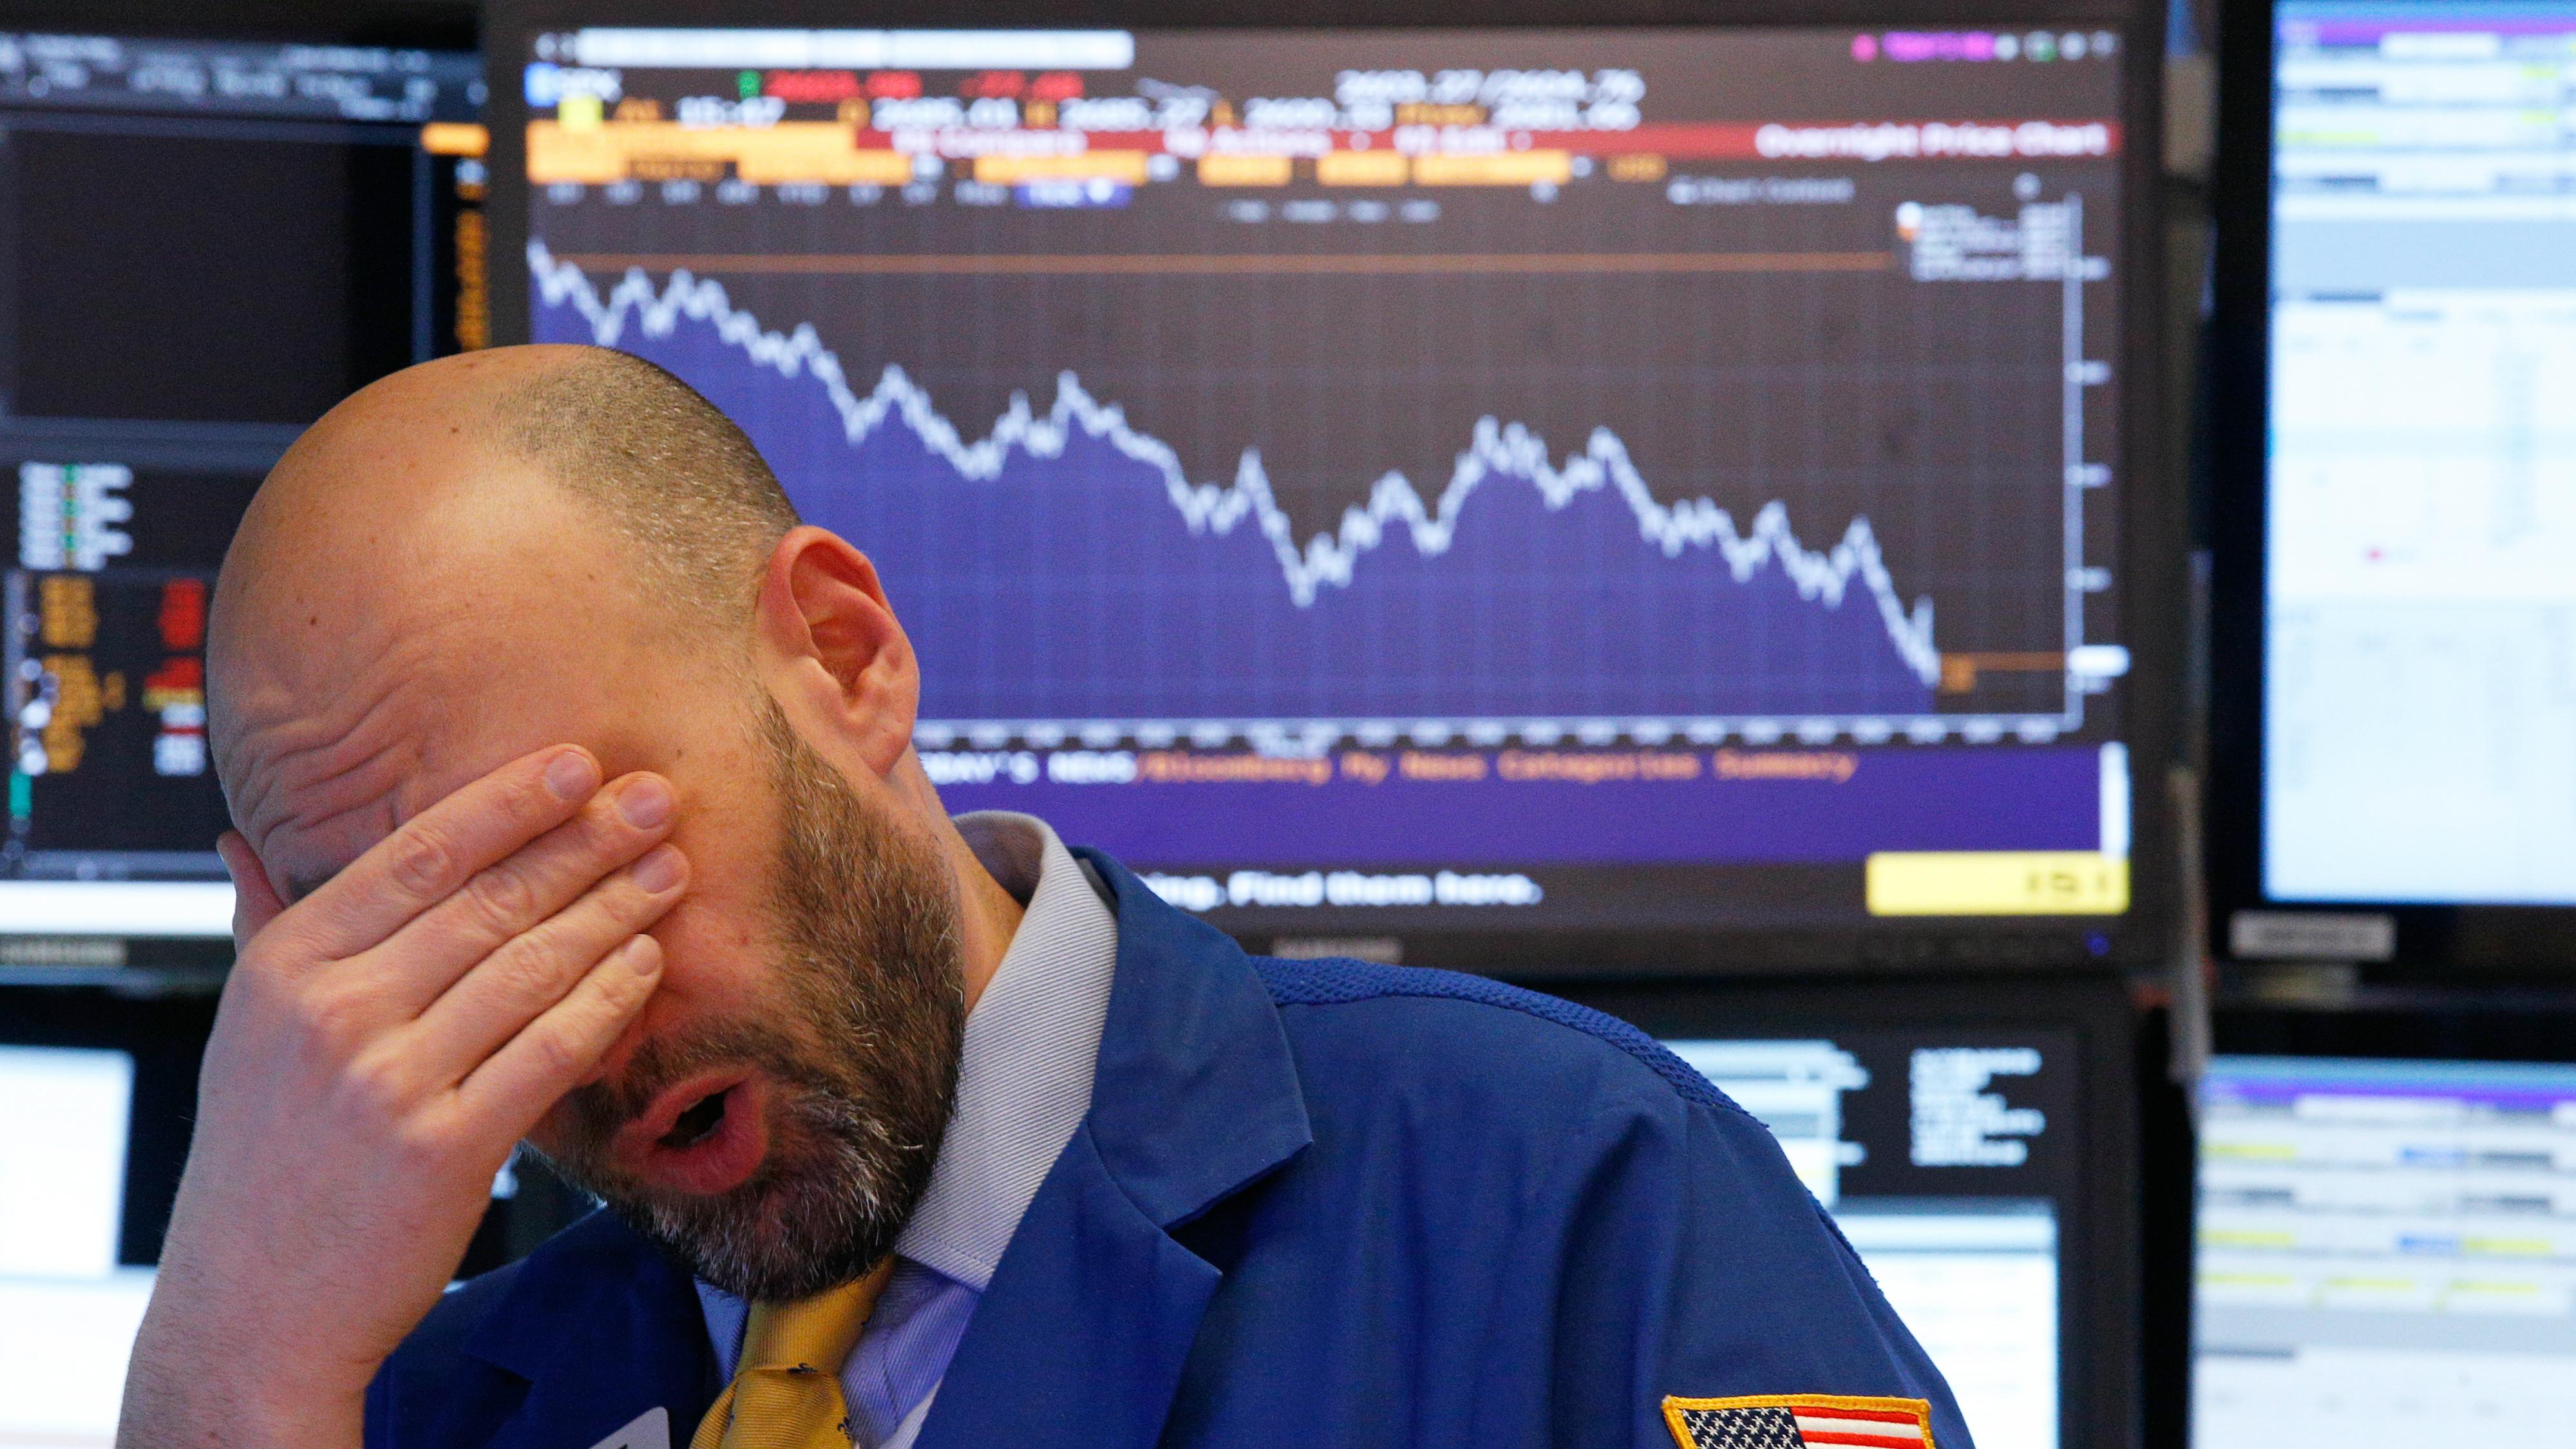 A sad Wall Street trader